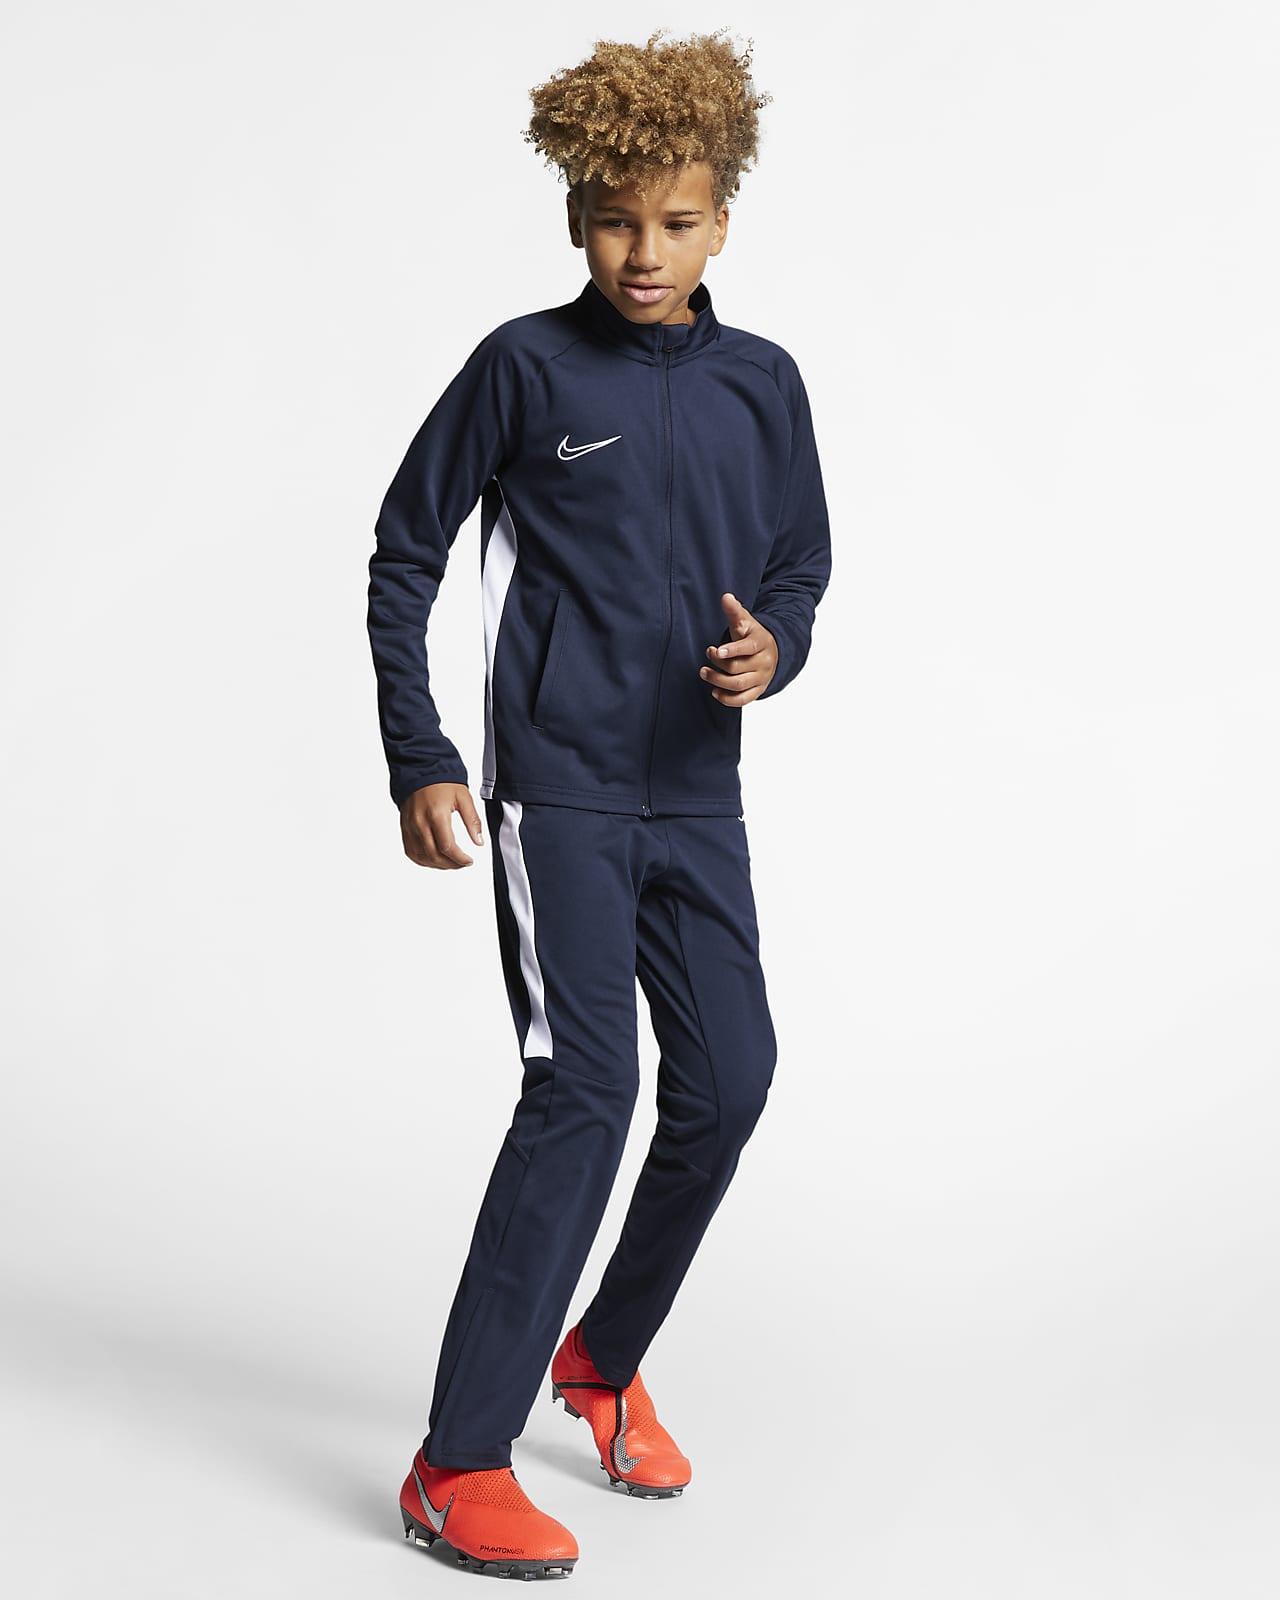 Nike Dri-FIT Academy Genç Çocuk Futbol Eşofmanı